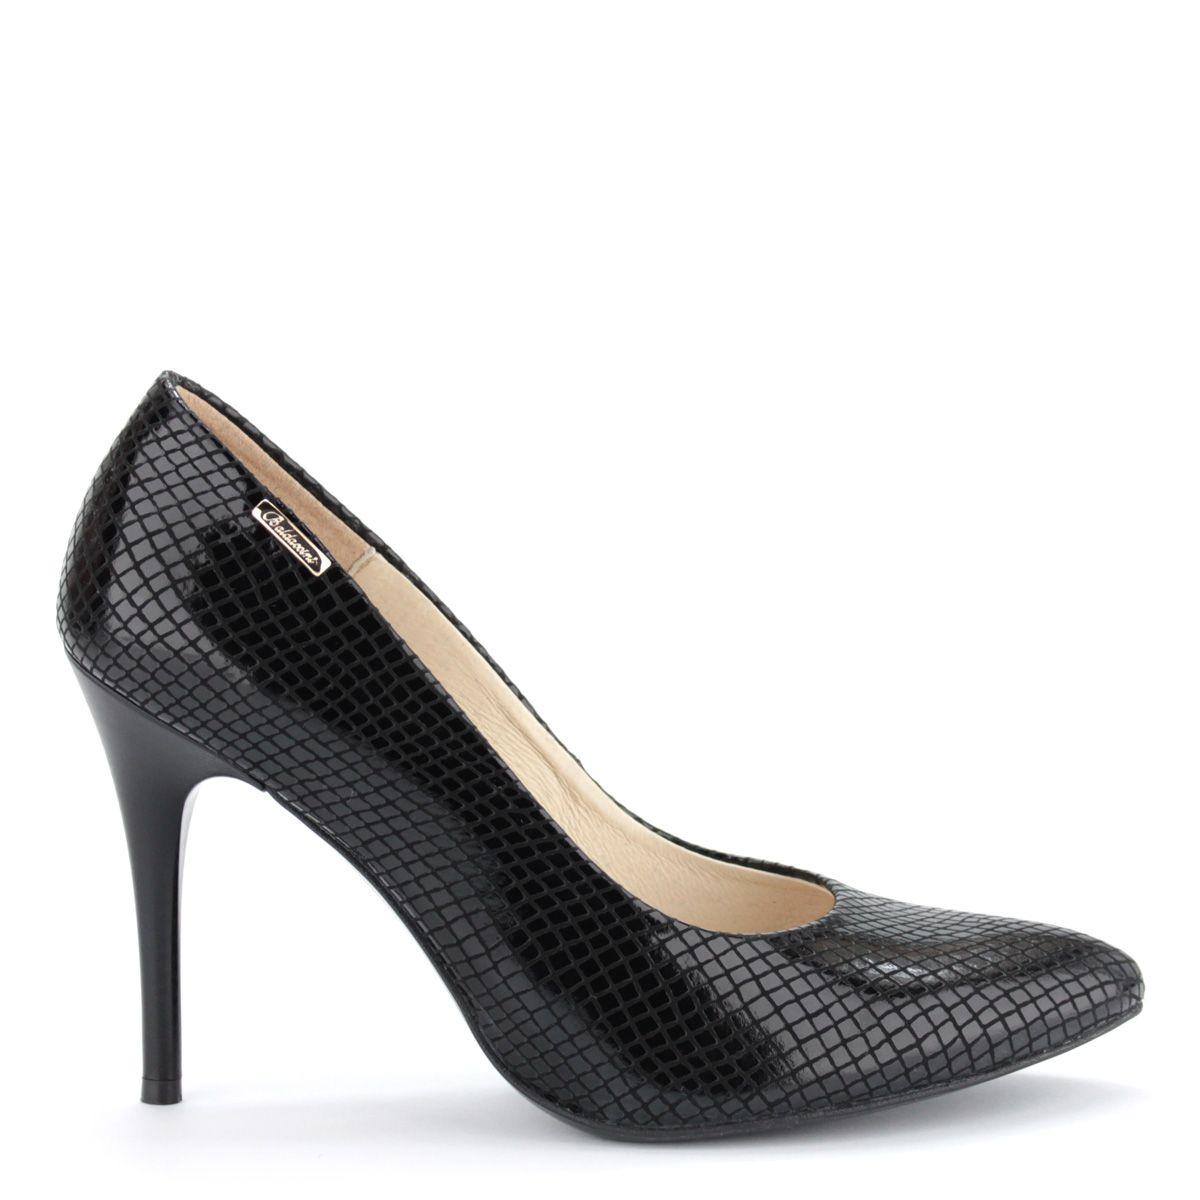 Magas sarkú hegyes orrú női alkalmi cipő 9 cm magas sarokkal ... e9e0579177